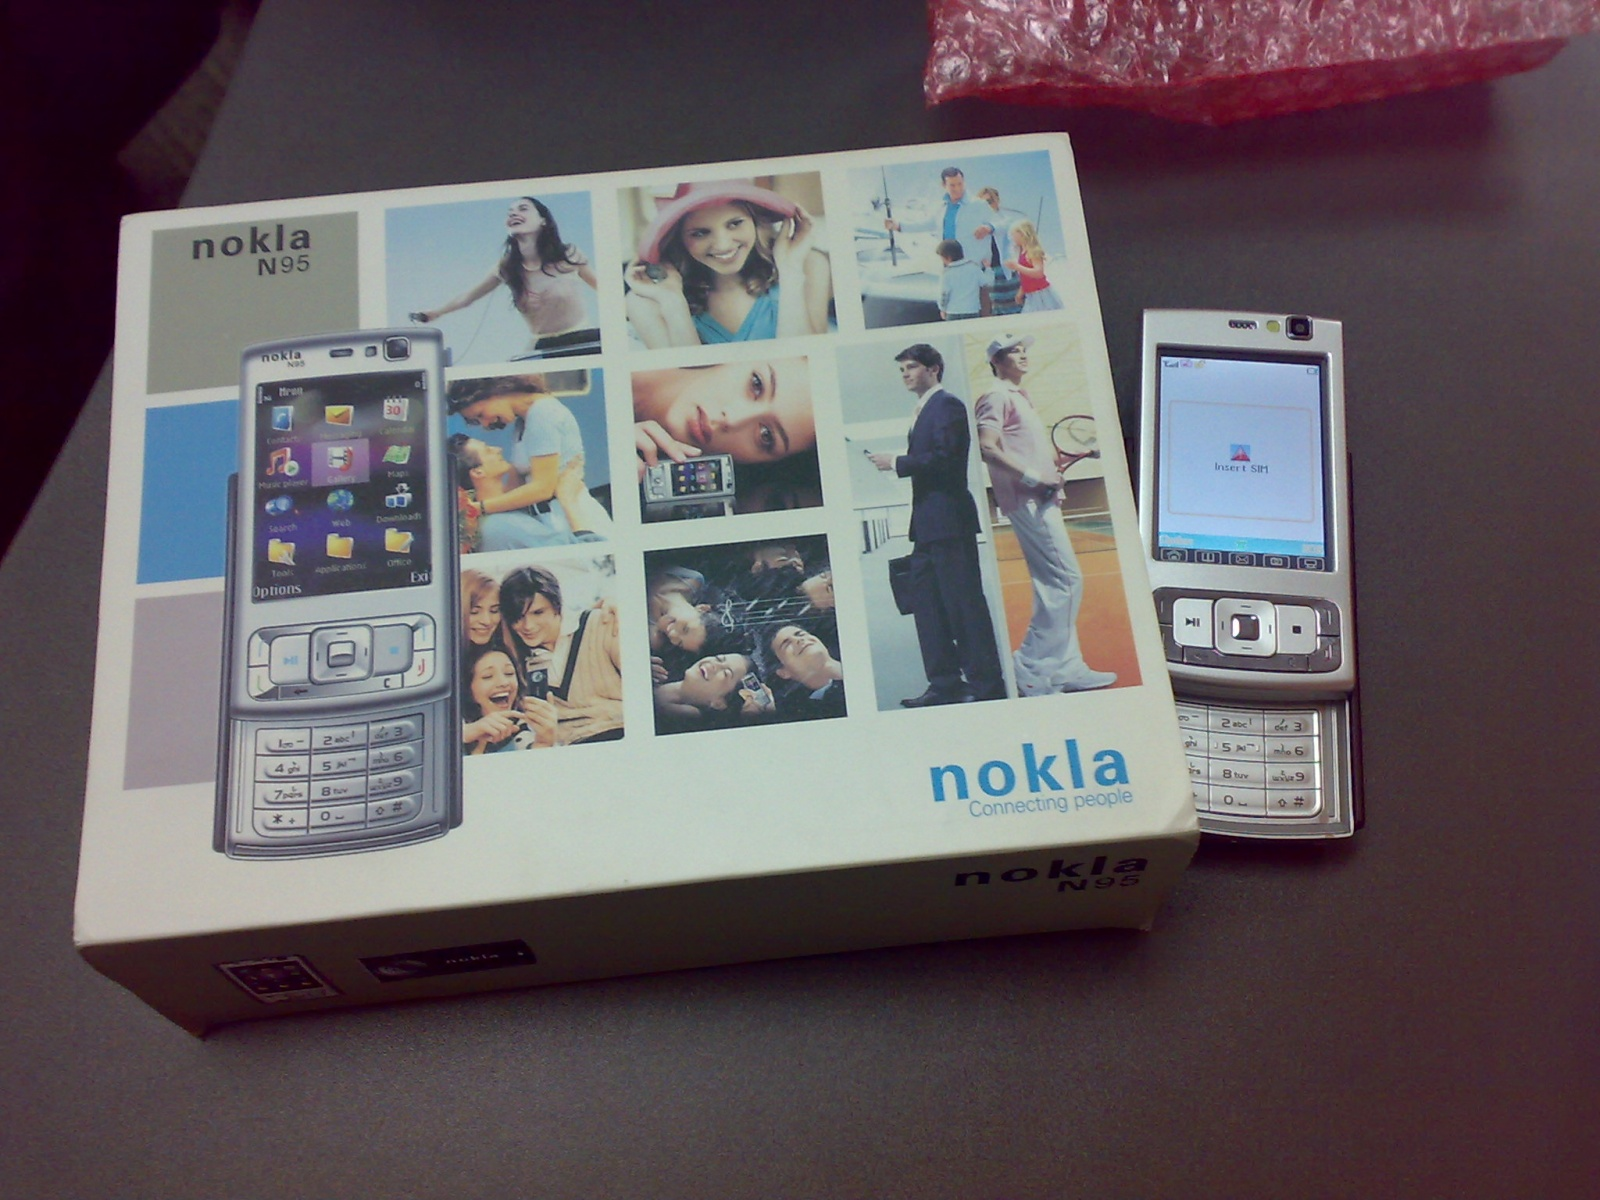 Nokia N95, лучший смартфон старой школы - 4